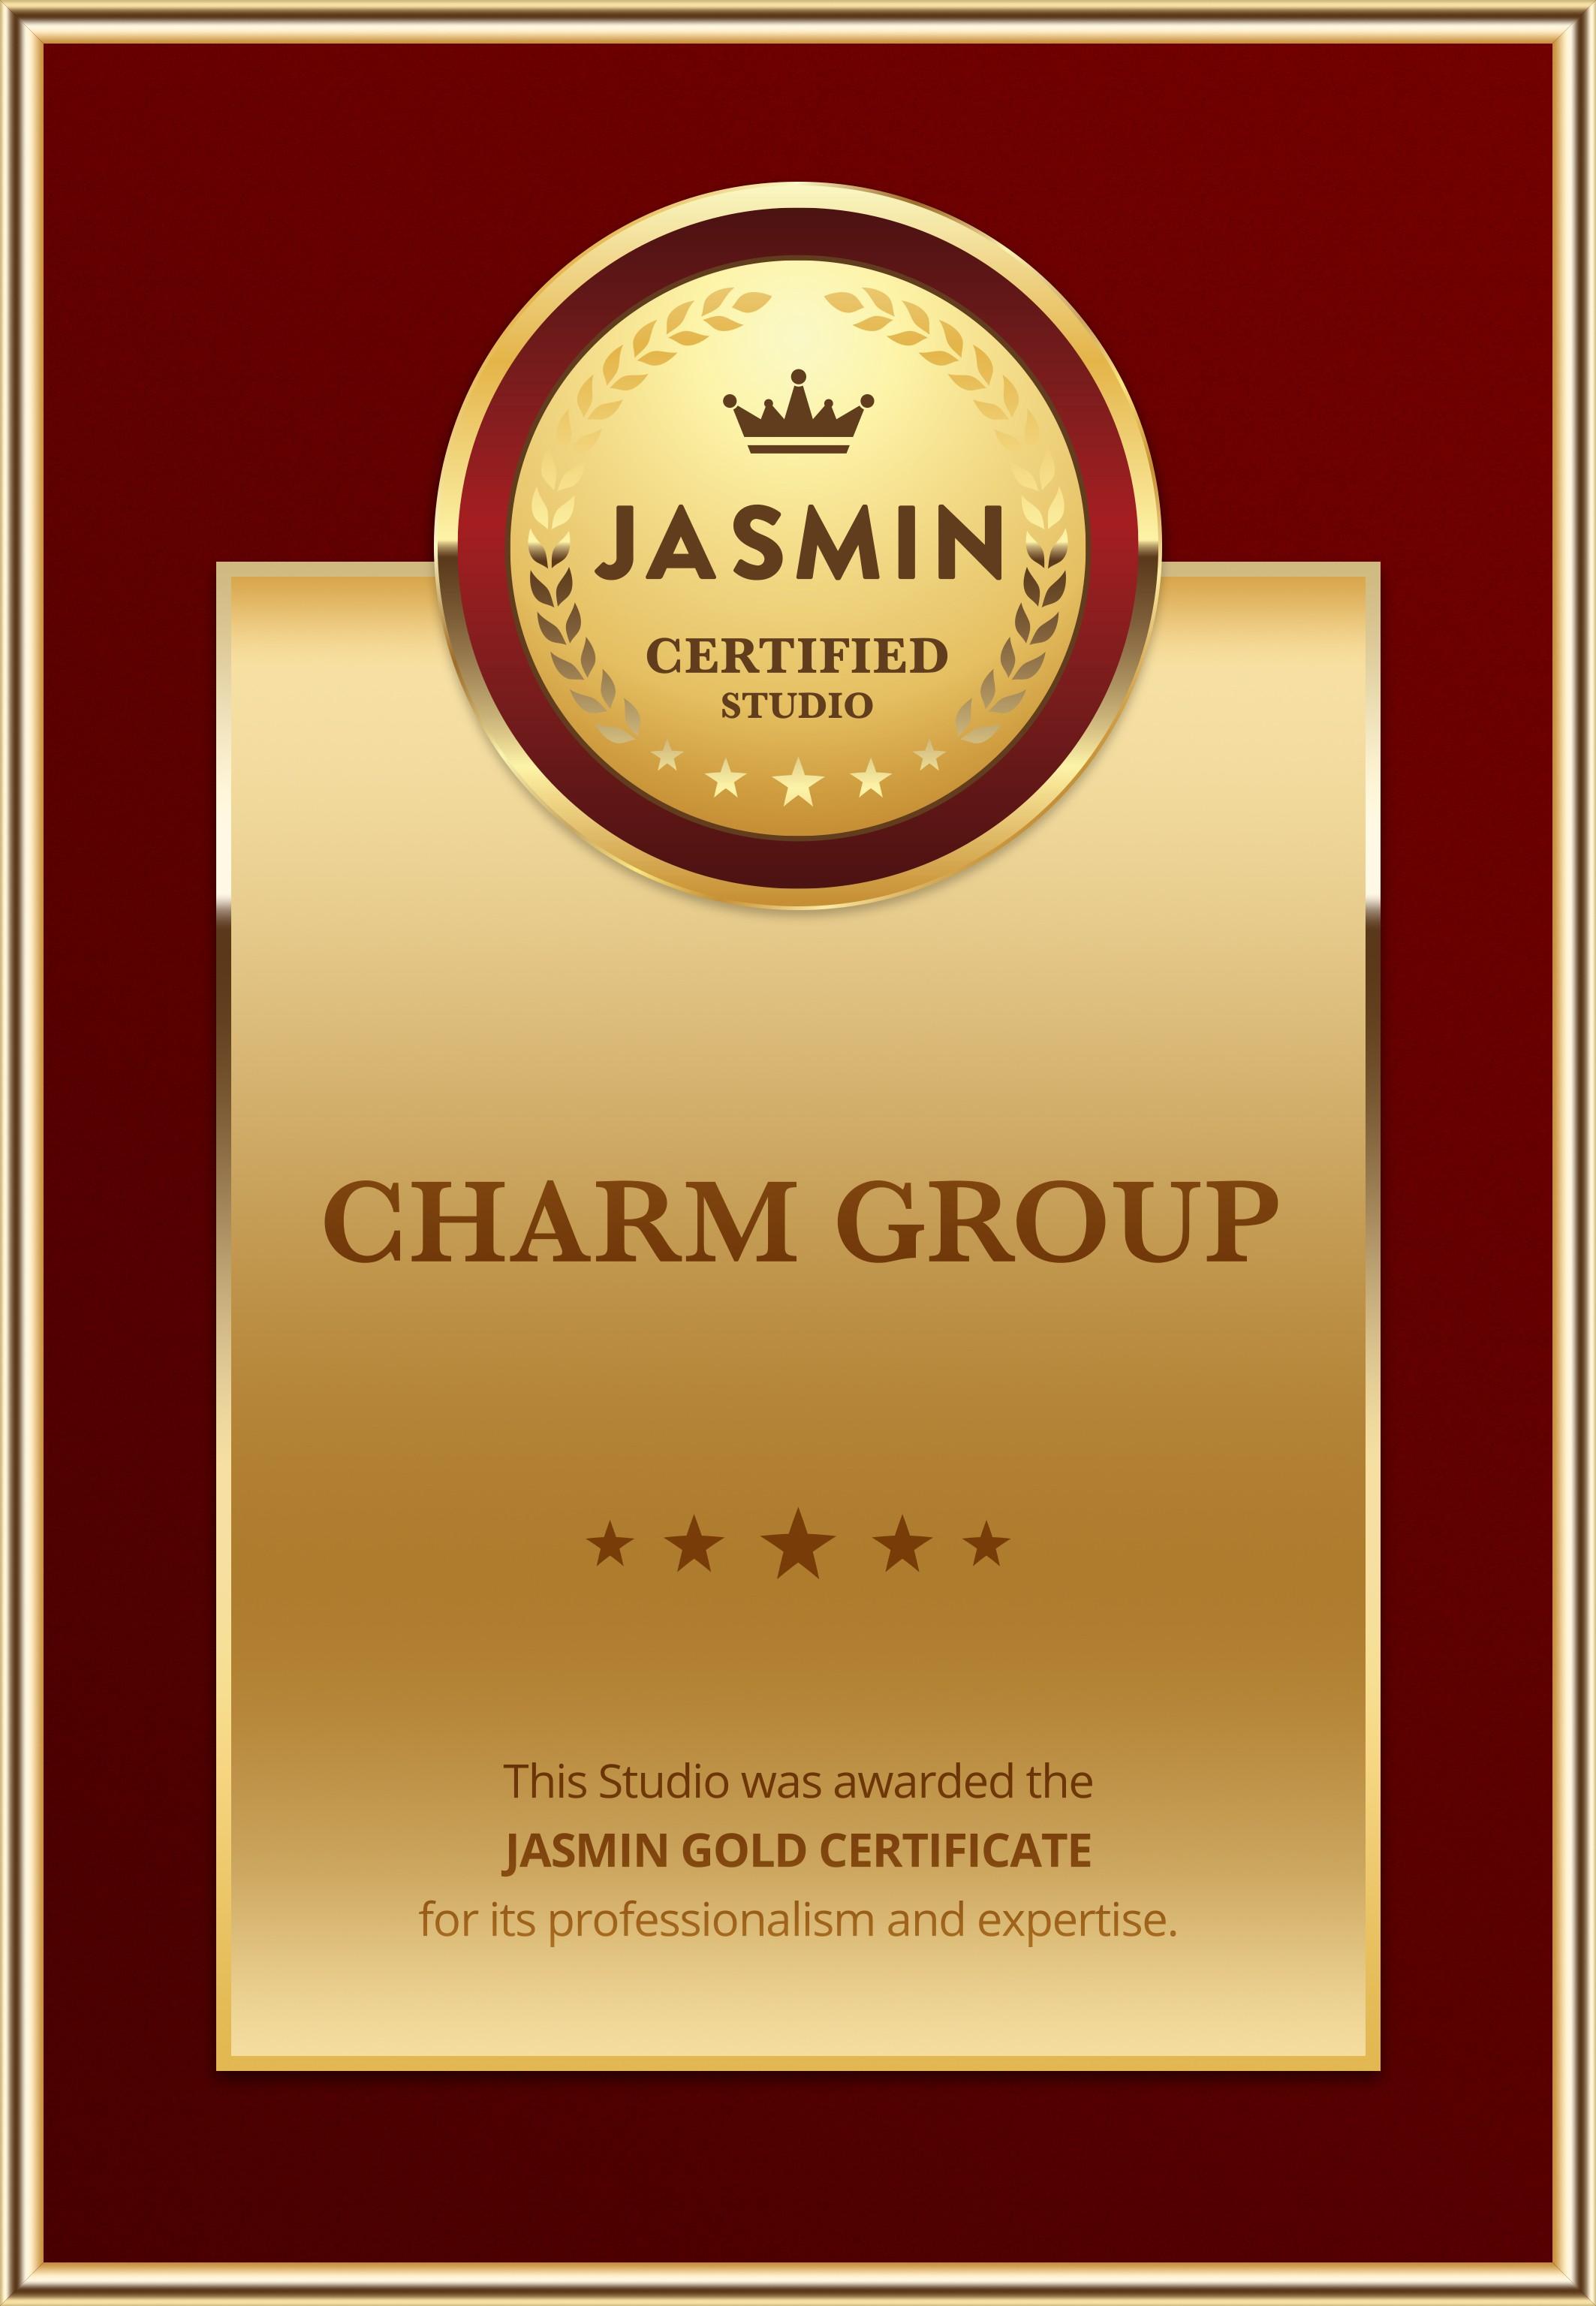 Jasmin_GOLD_Certificate_CharmStudio